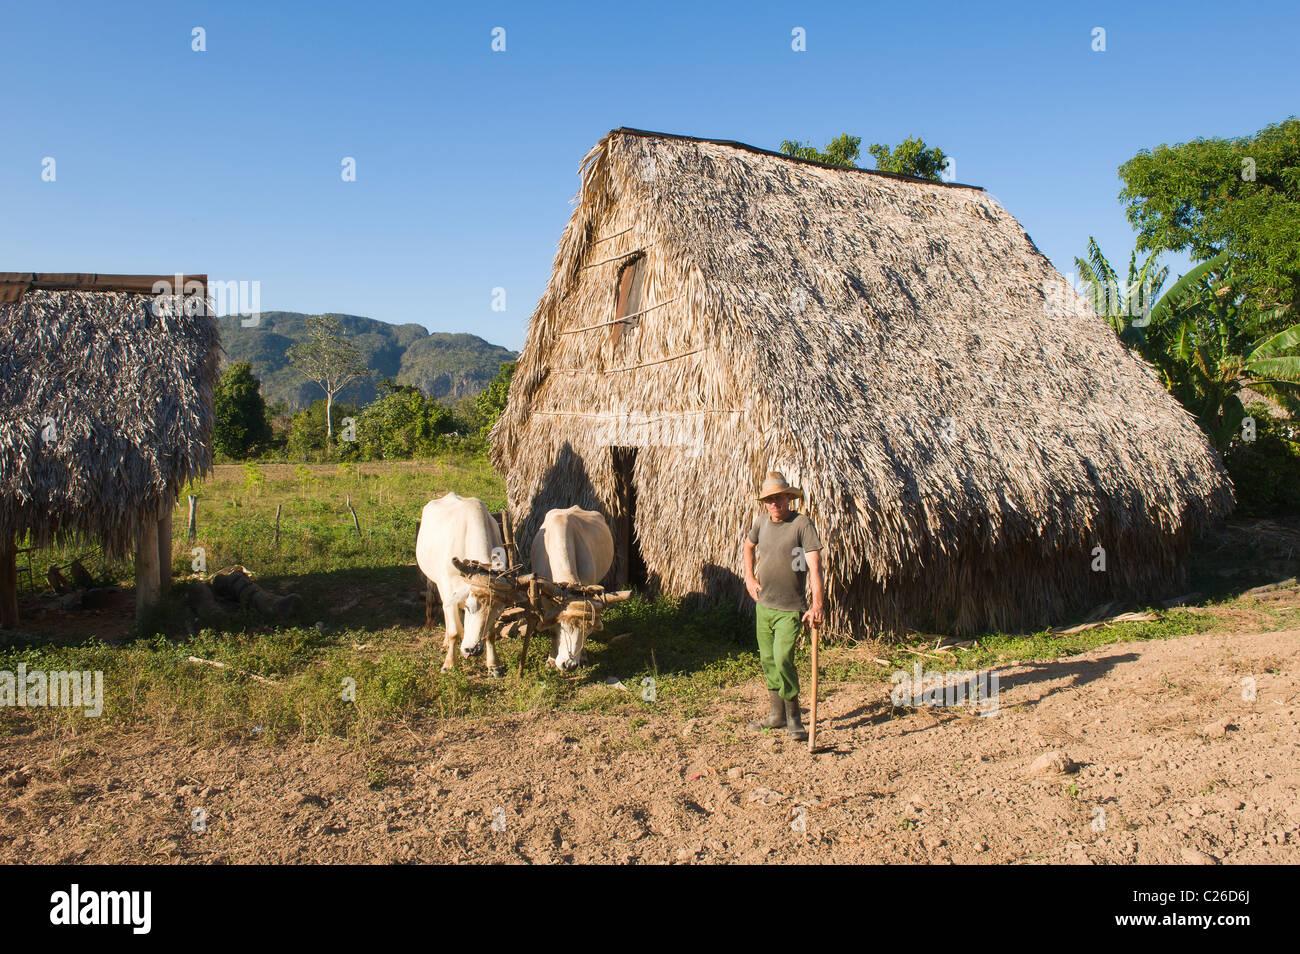 Vinales Valley, Hut where tobacco leaves are dried, Mogotes, Pinar del Rio Province, Cuba - Stock Image